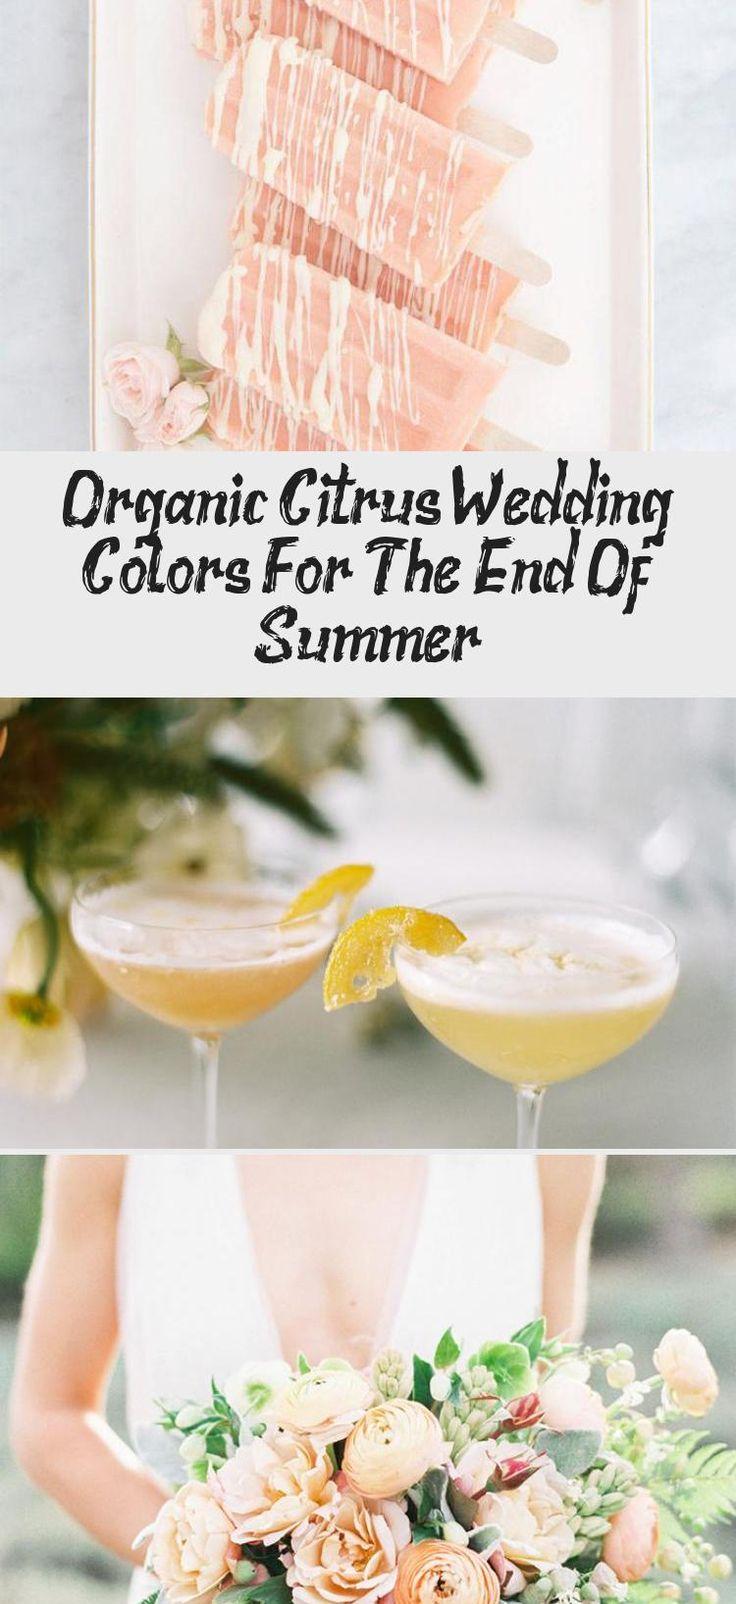 Organic Citrus Wedding Colors for the End of Summer #Botanicalgardenwedding #gardenweddingDeko #Romanticgardenwedding #Moderngardenwedding #gardenweddingIndian